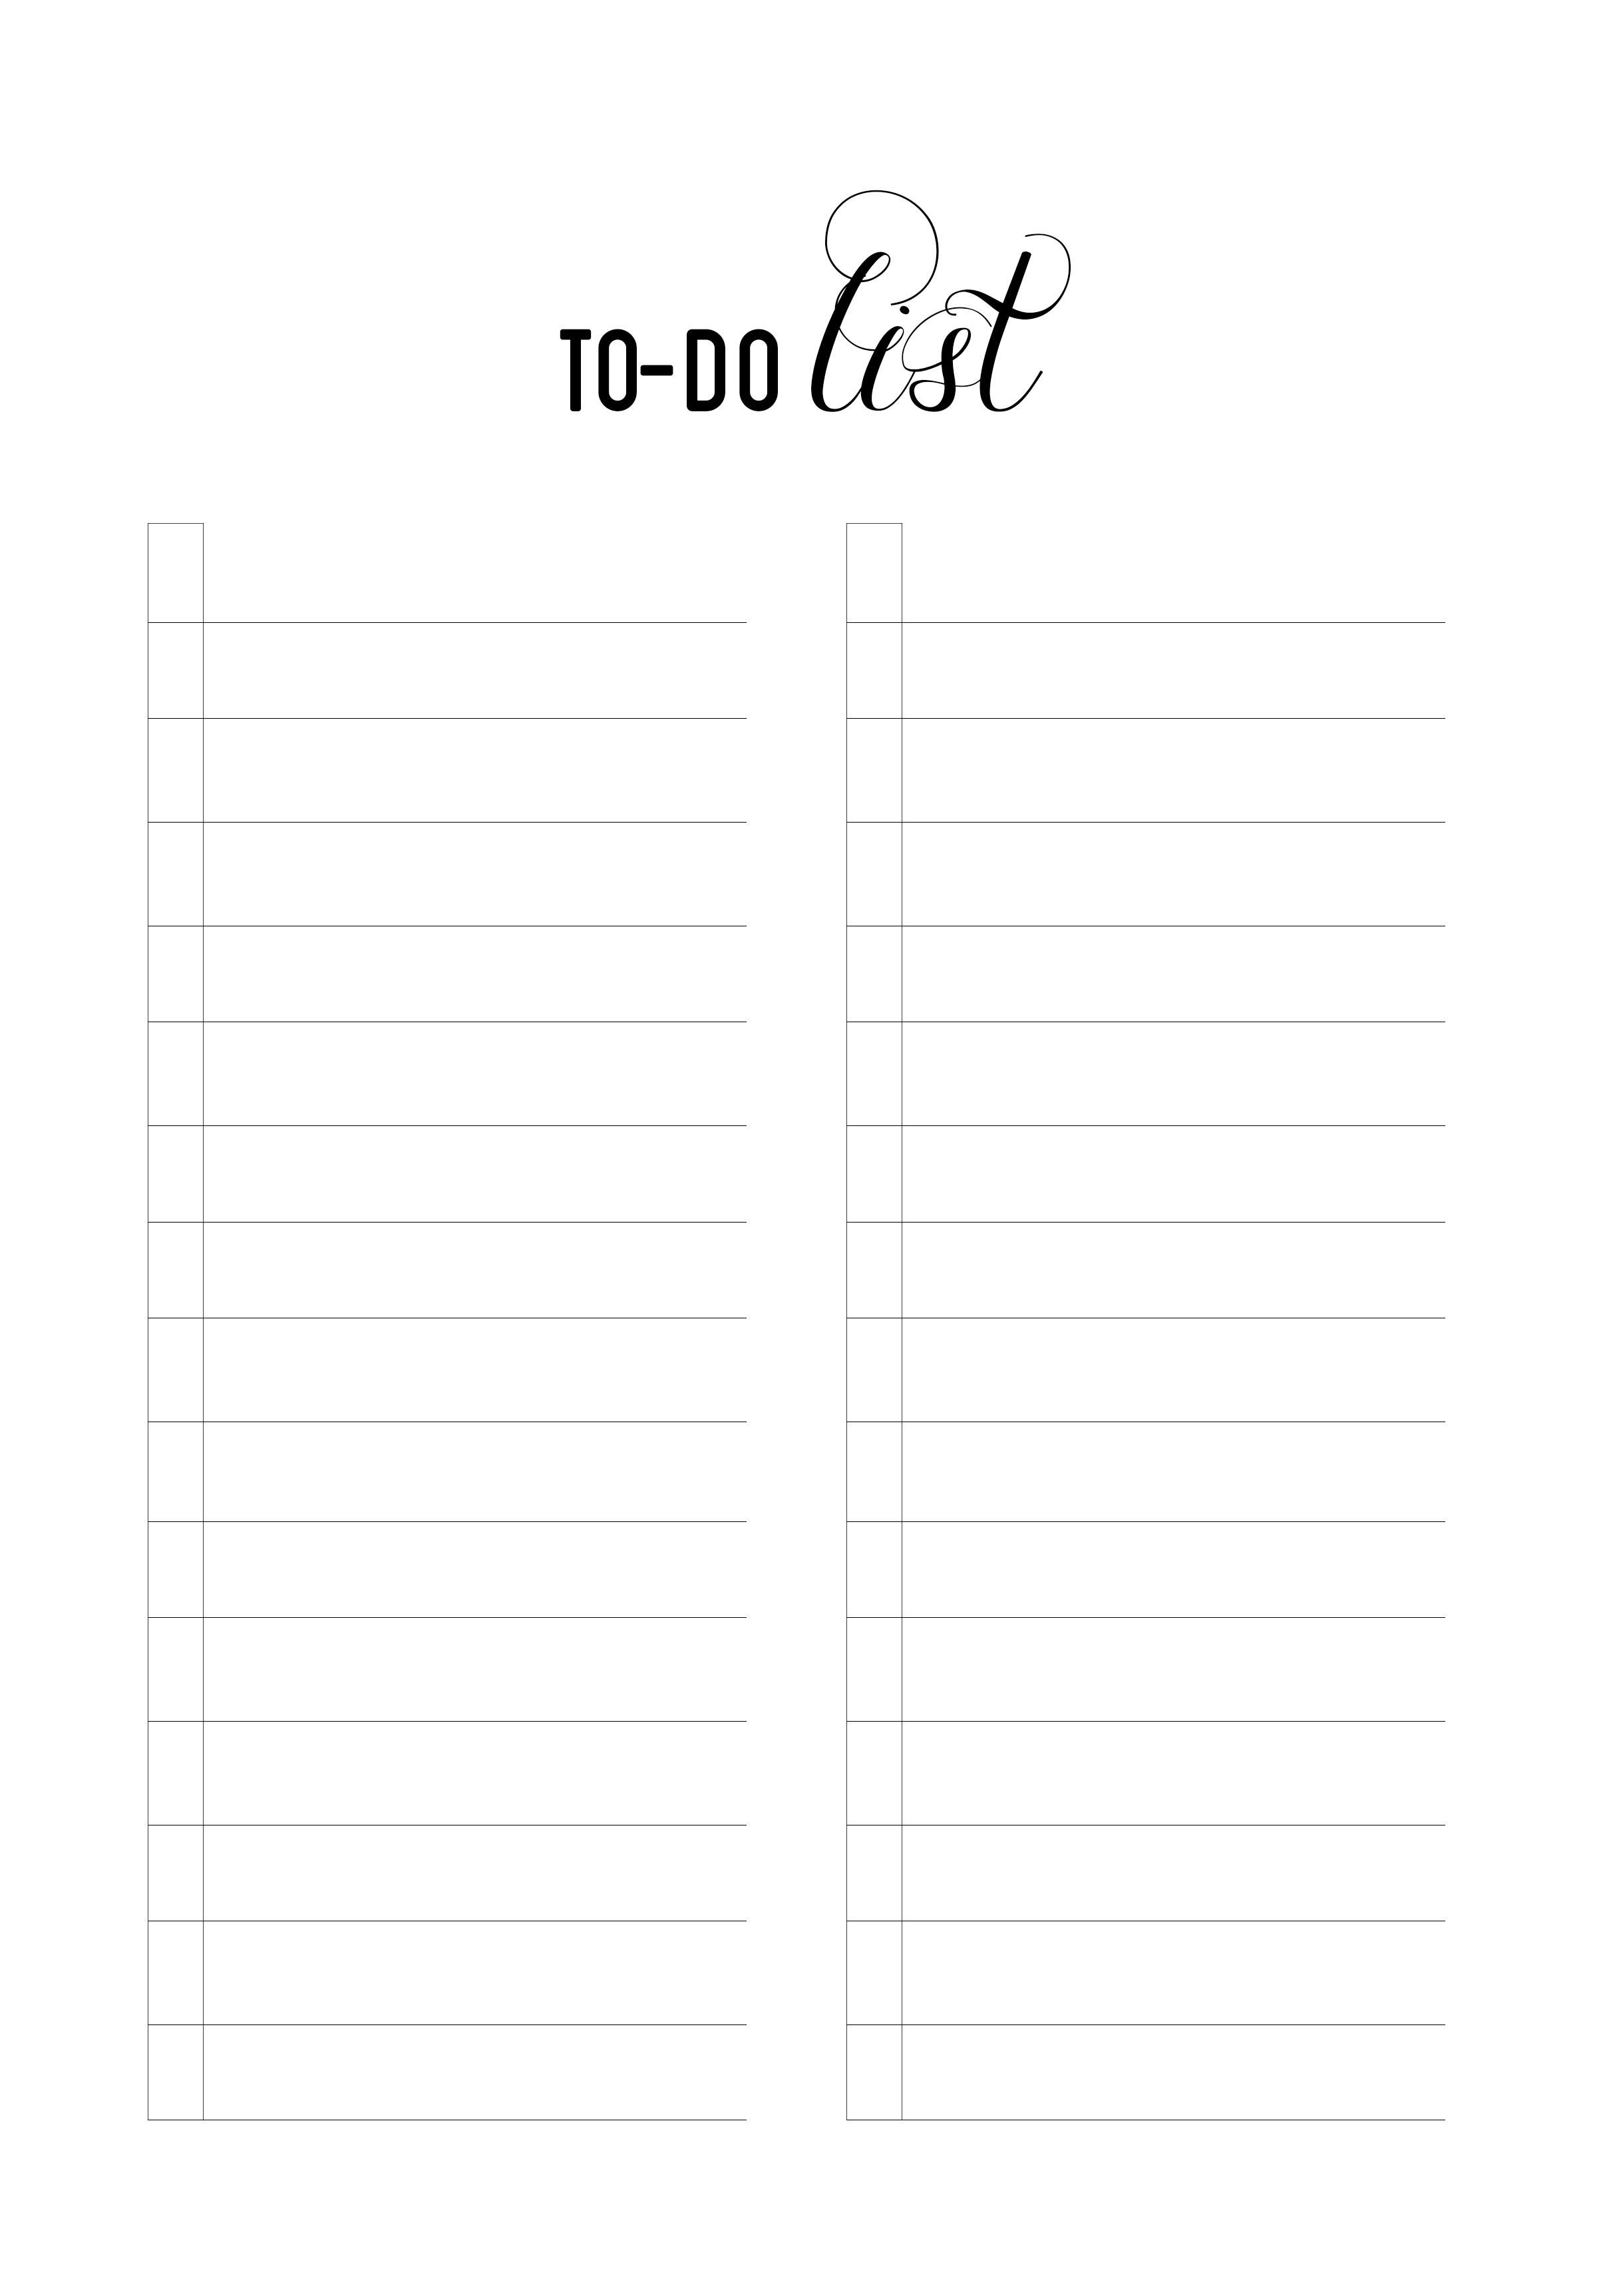 To Do List Printable On Storenvy